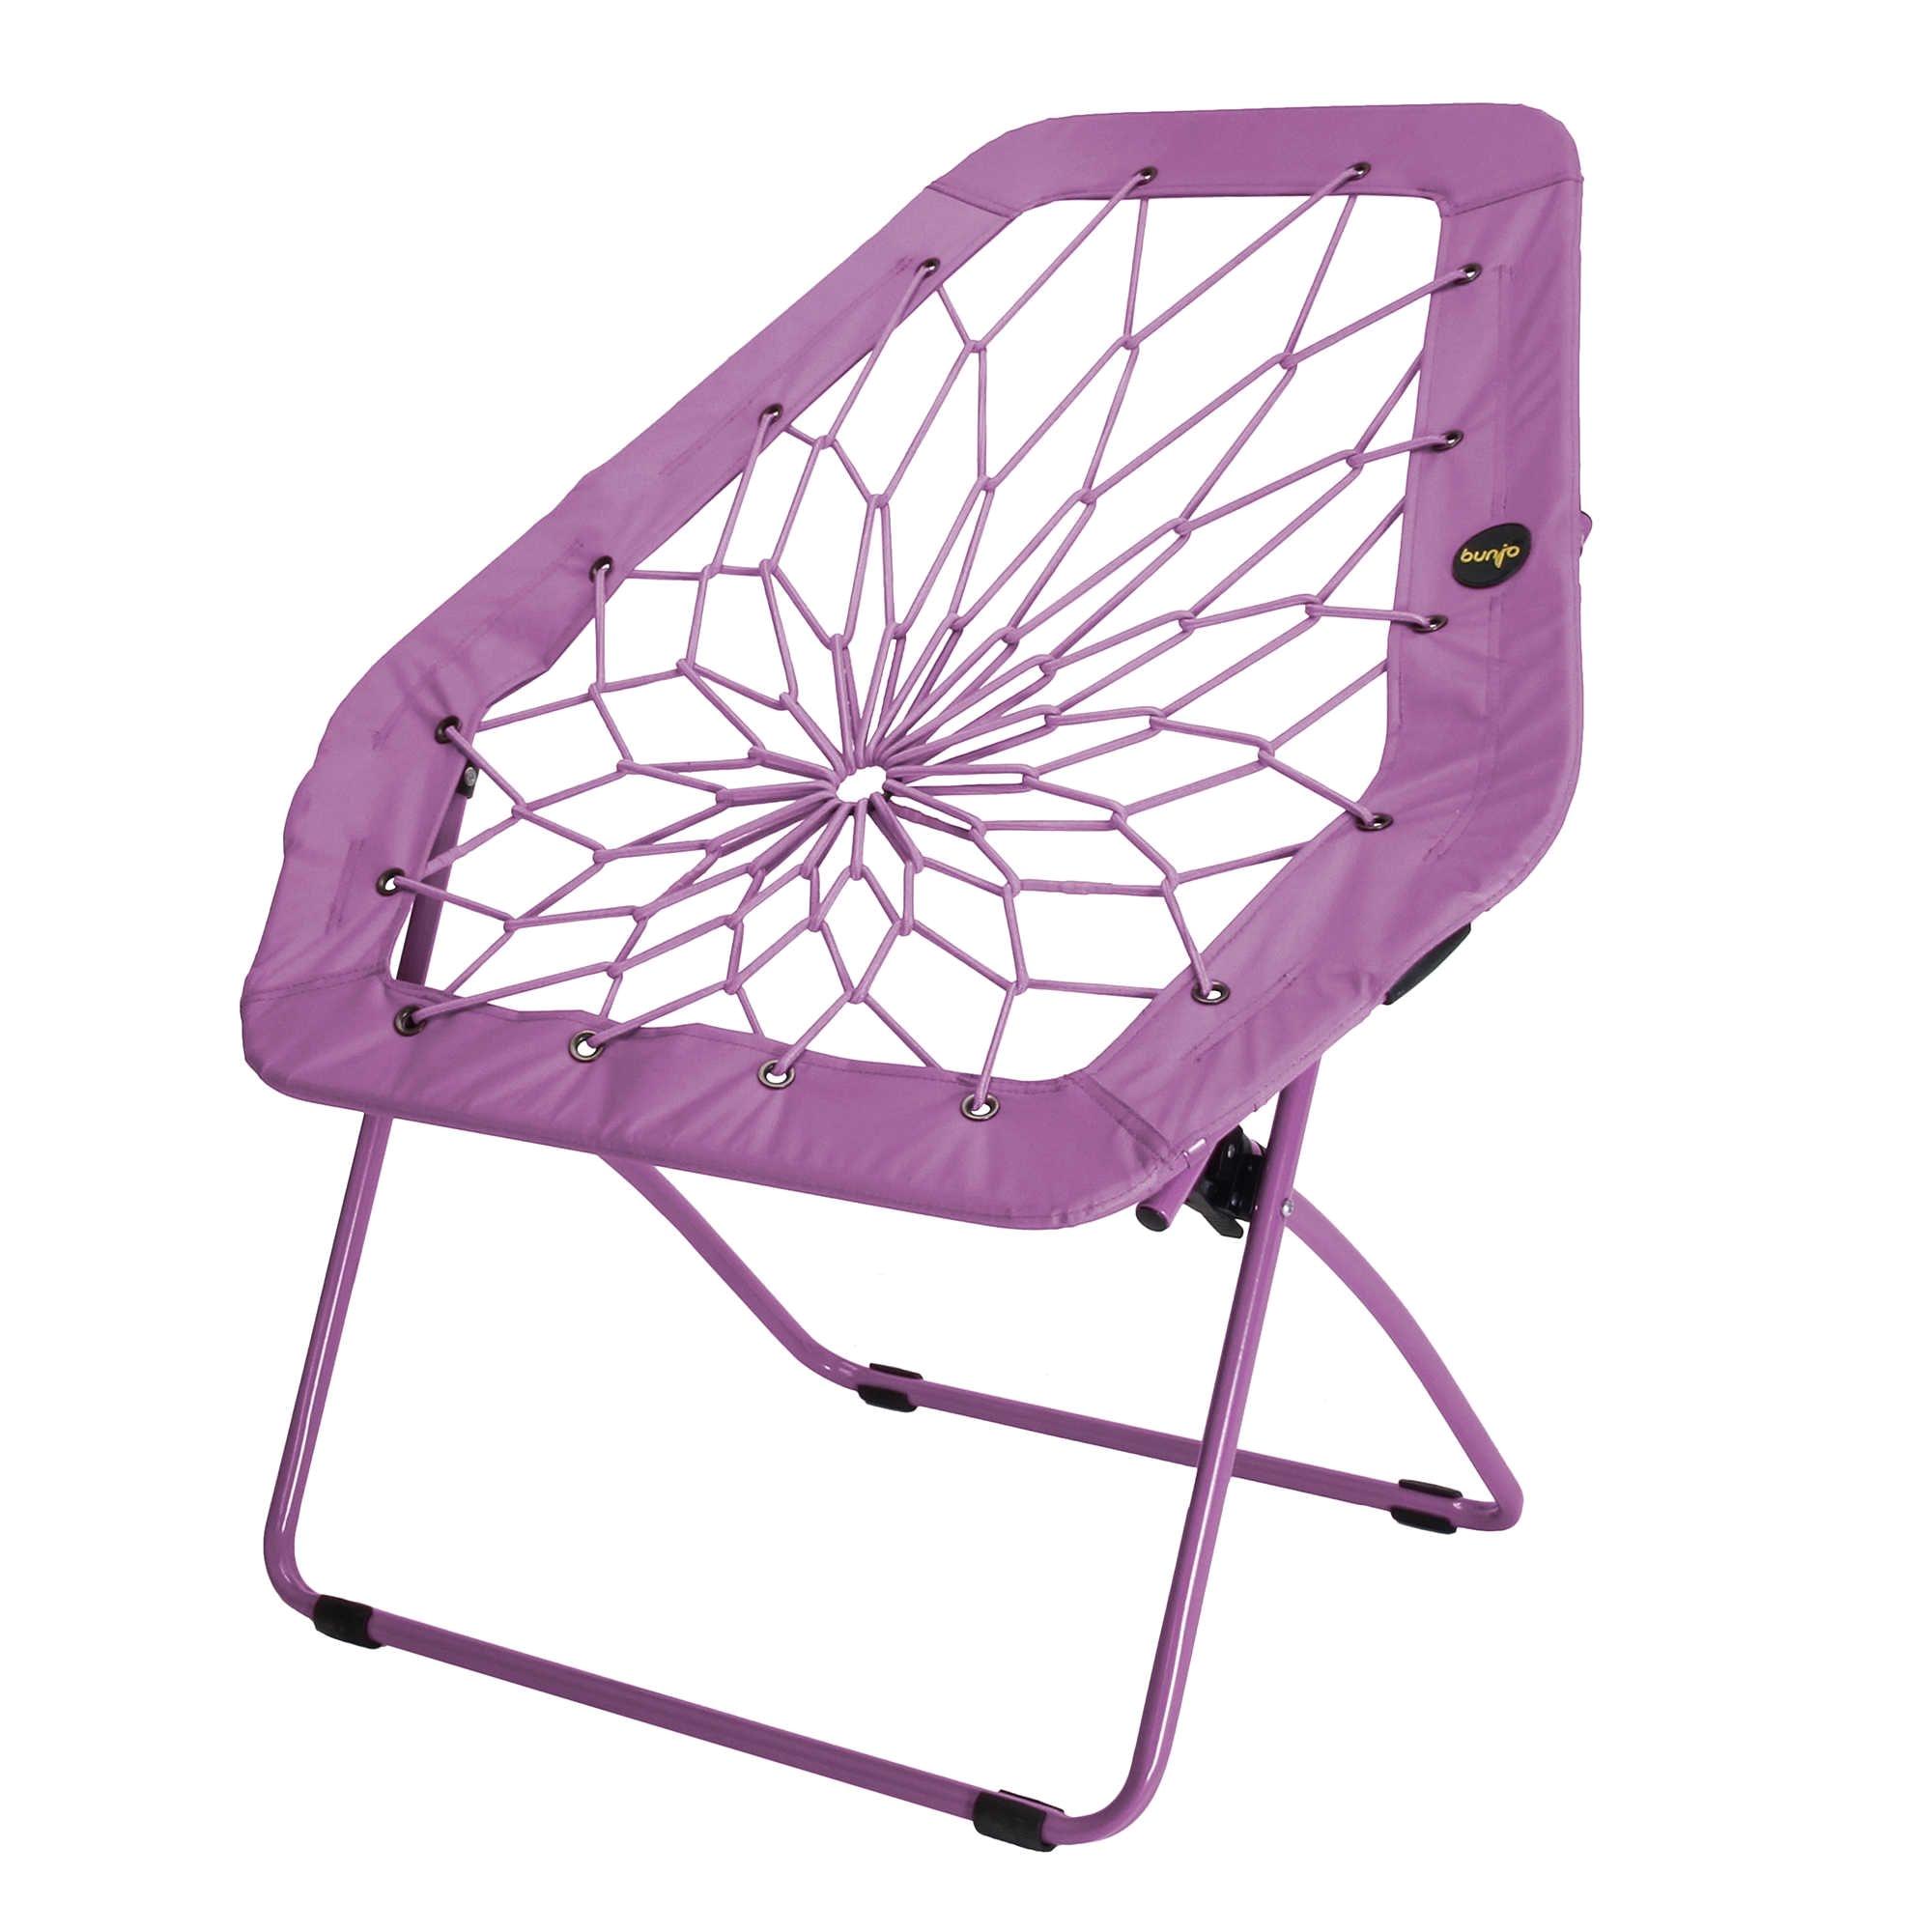 Bunjo Chair Canada Bunjoa Oversized Bungee Chair College List 2 Pinterest